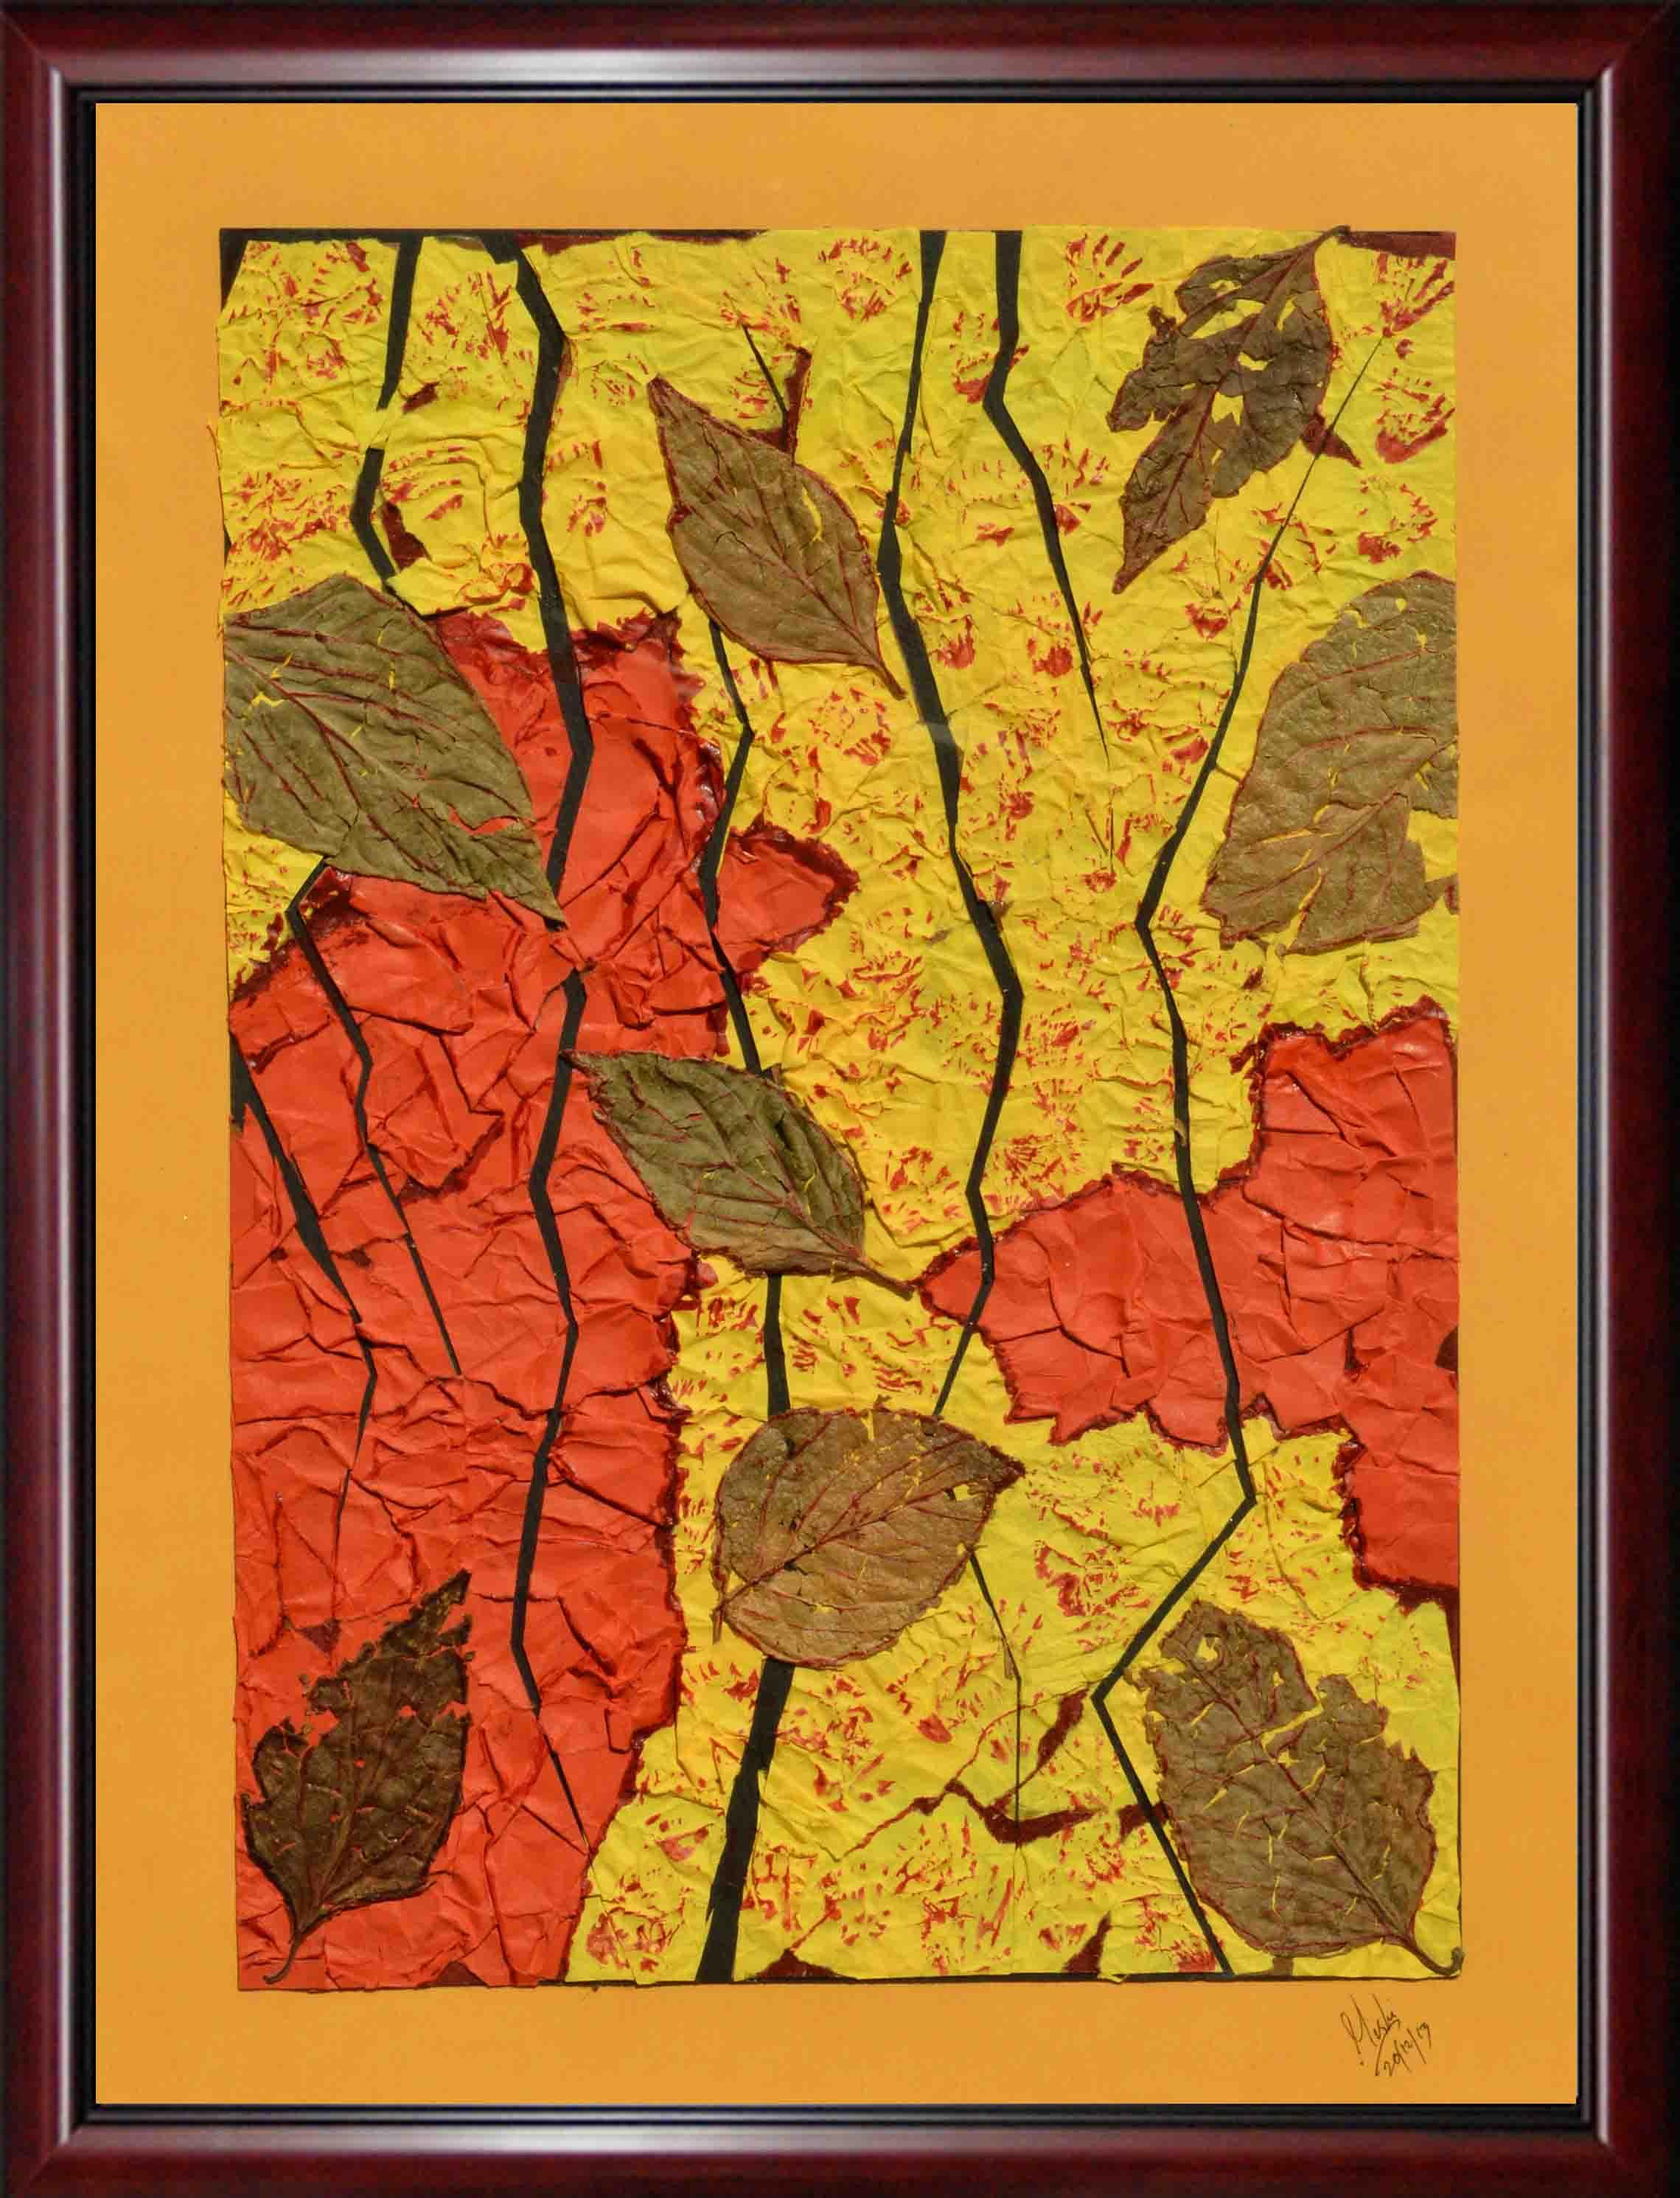 COLORS OF BARREN LAND - Mixed Media Wall Art Home Décor | World Art ...